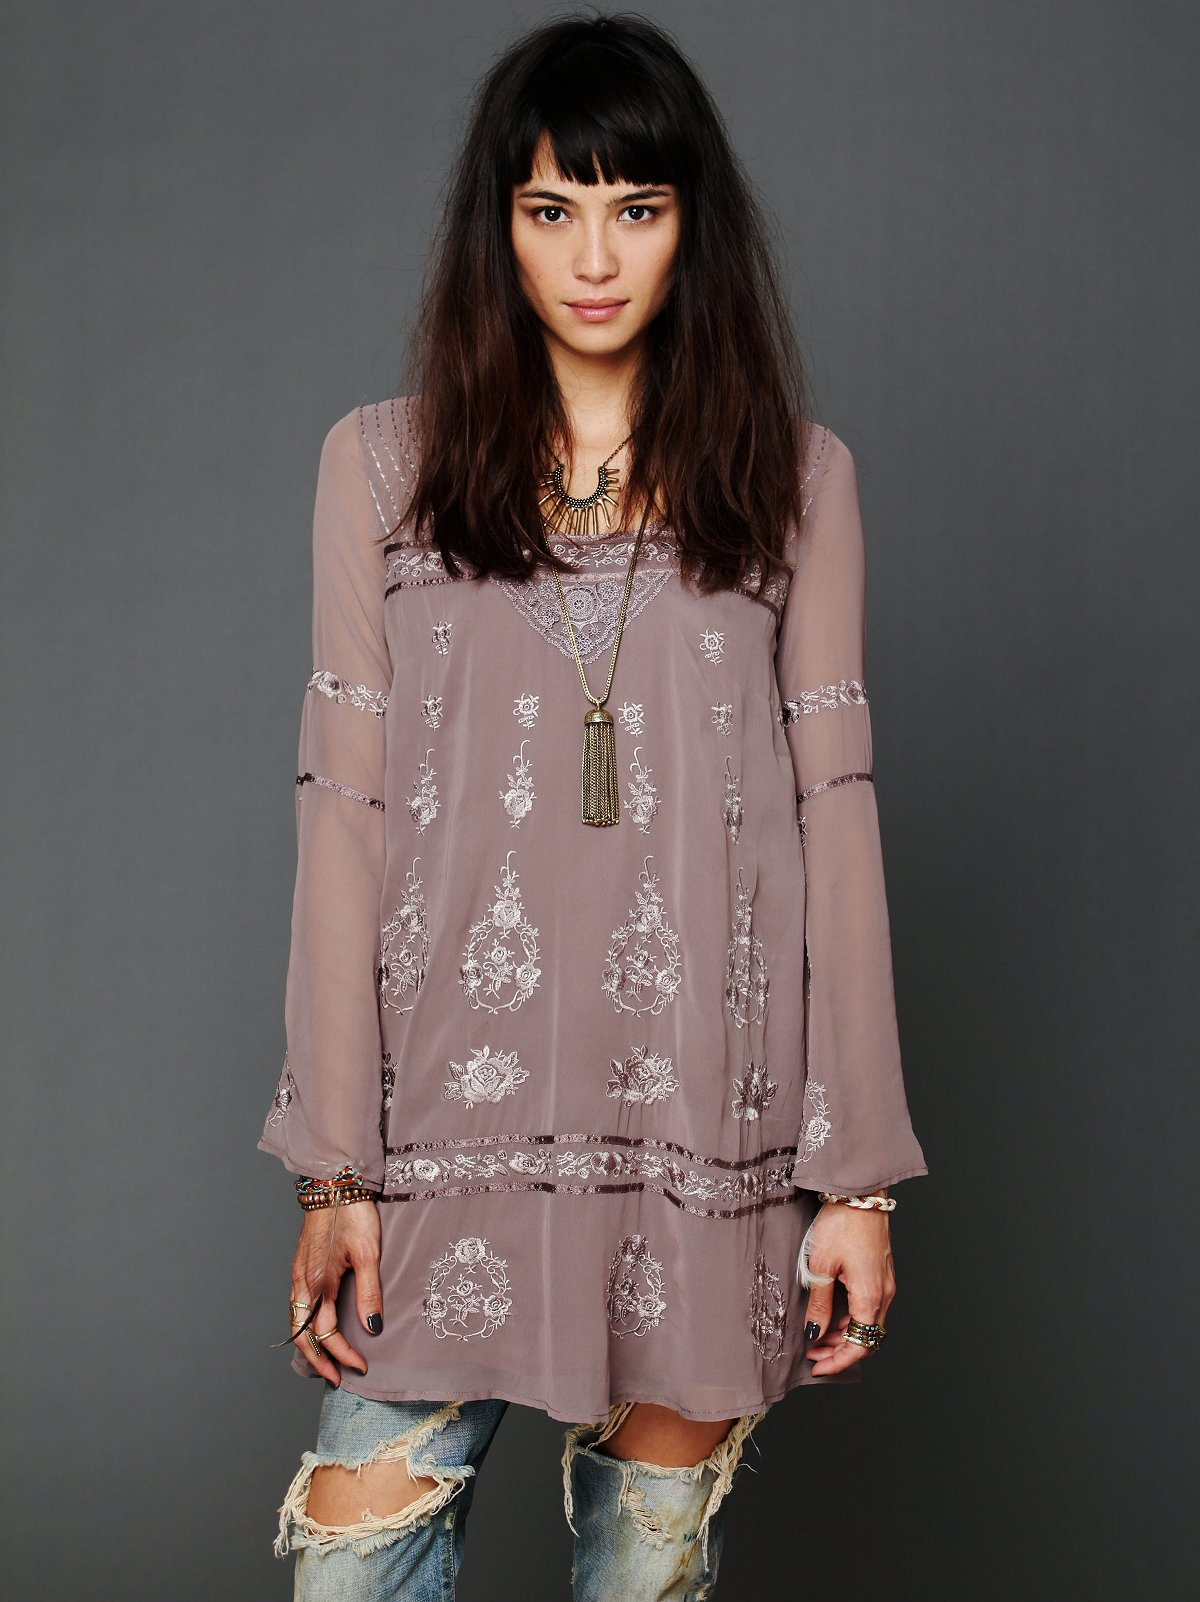 Untold Secrets Dress